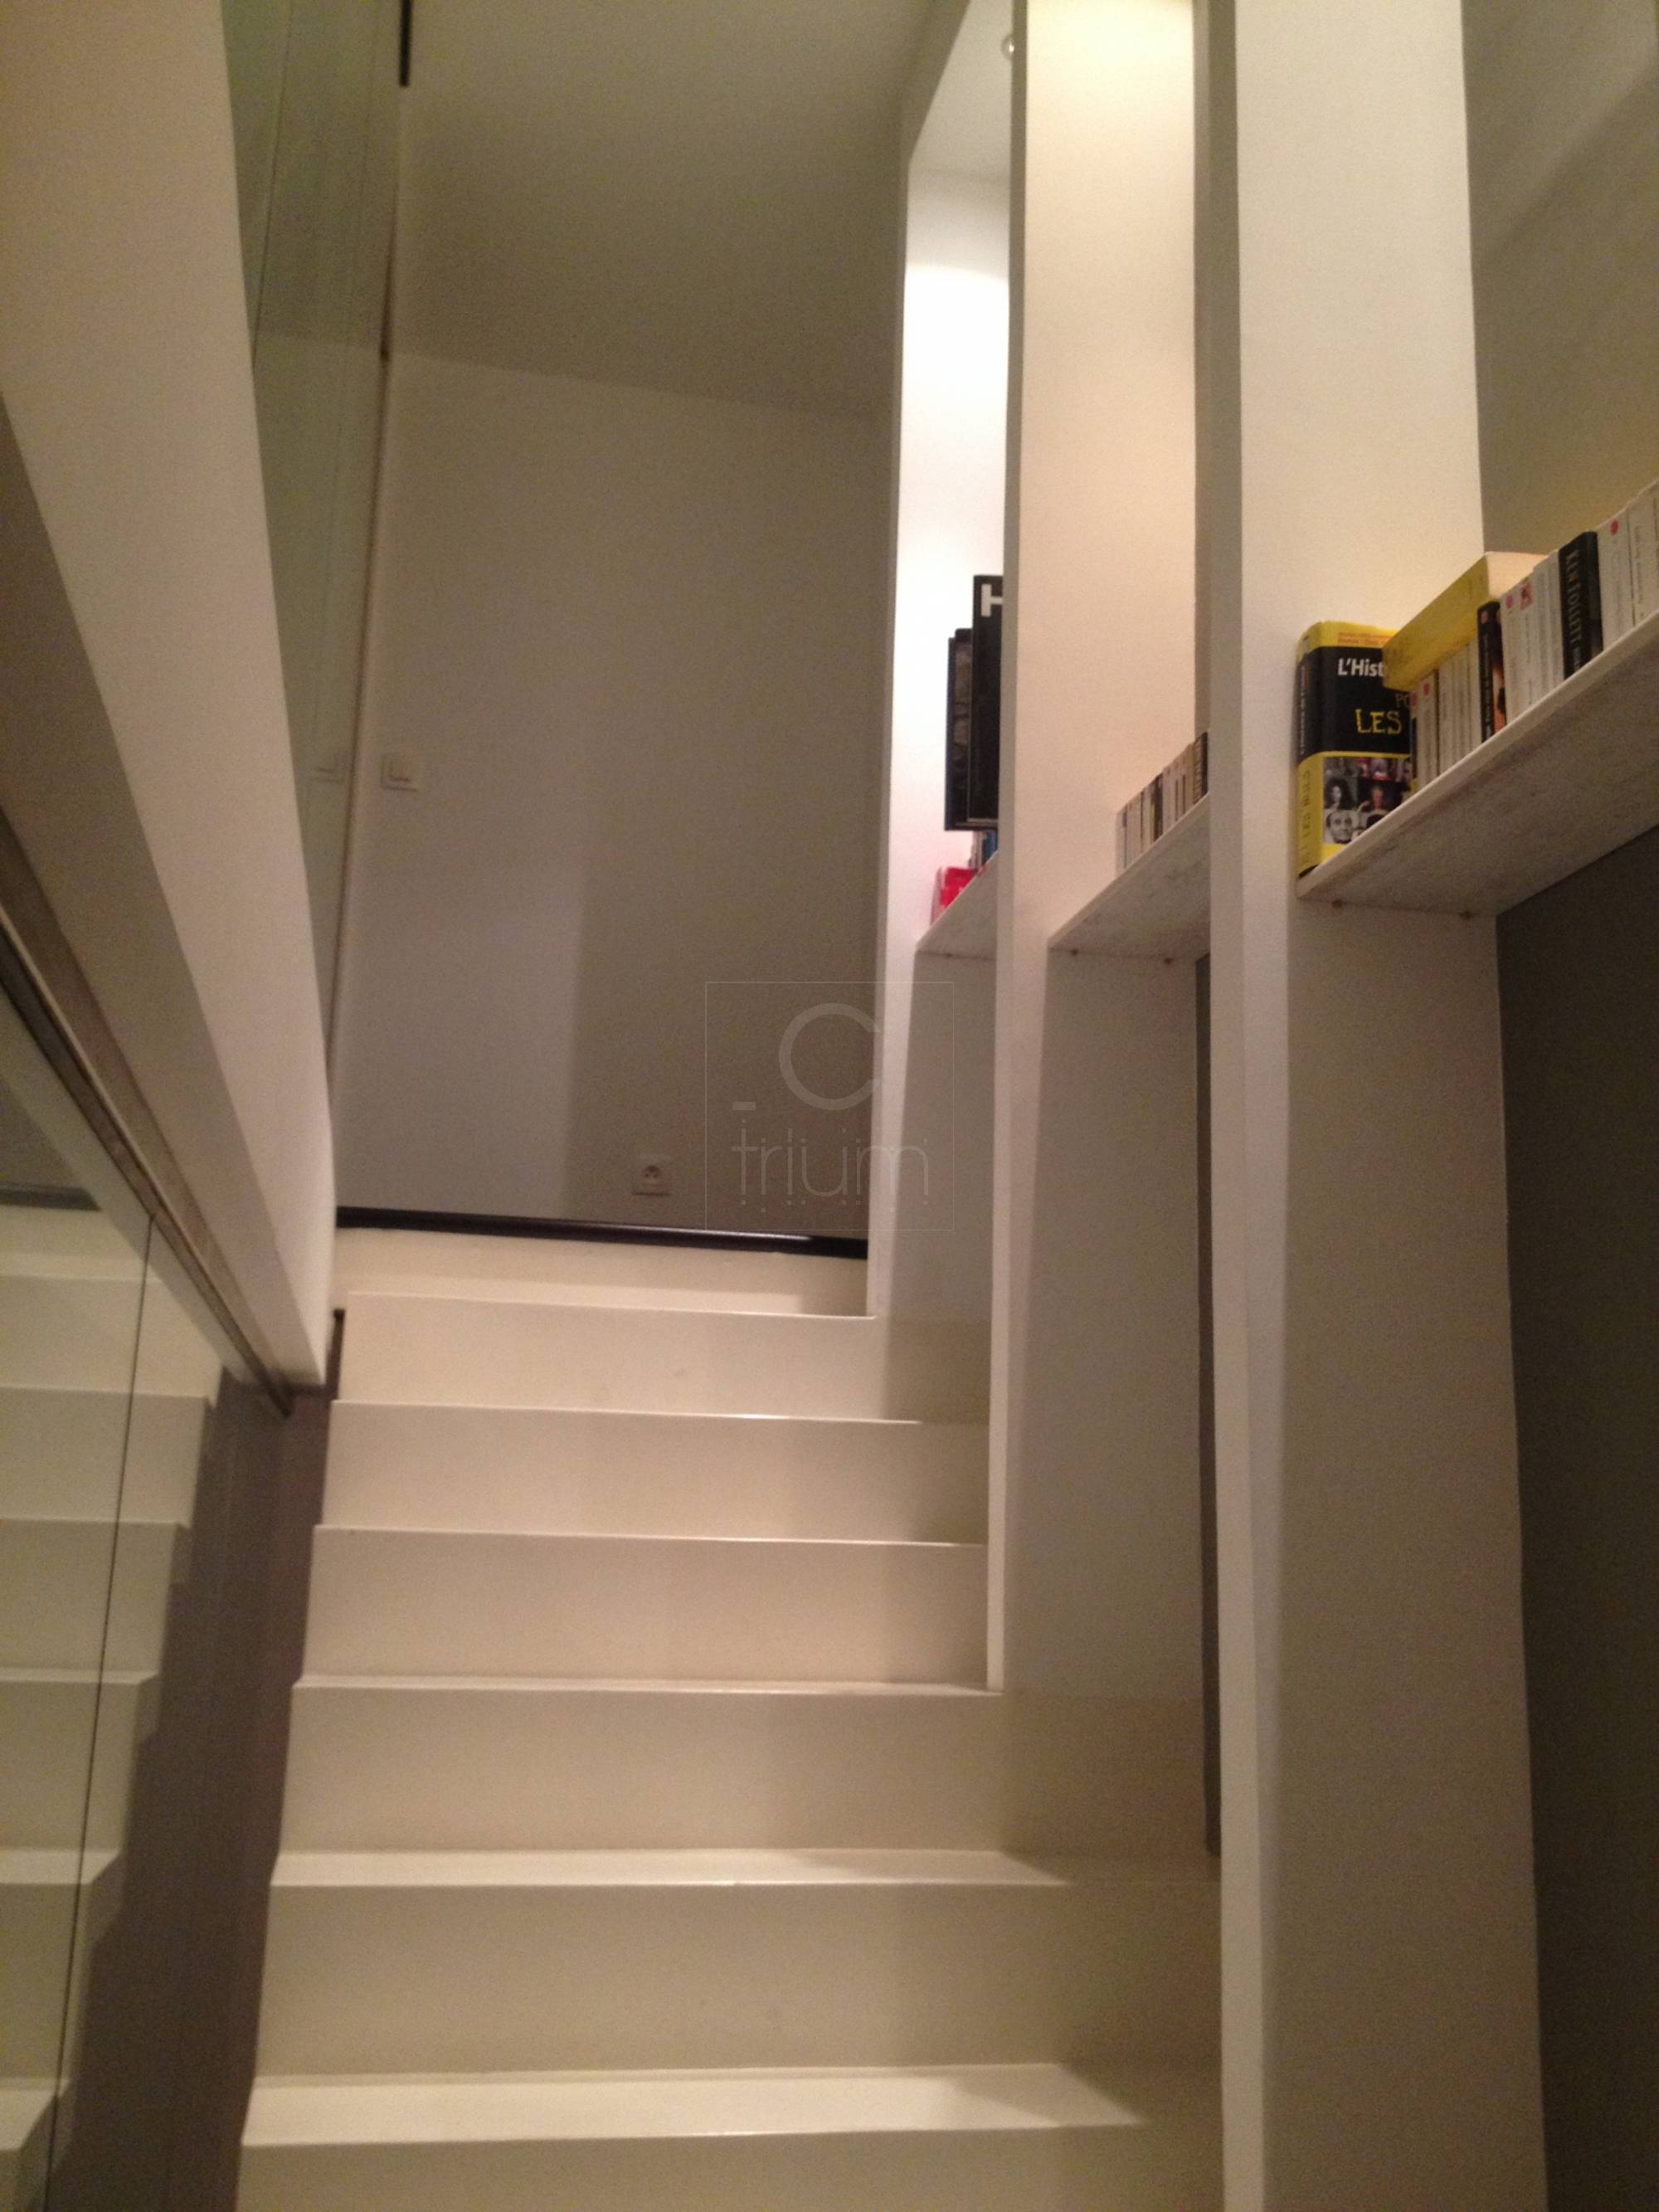 Vente appartement t4 f4 marseille 13006 bd notre dame for Appartement atypique 91